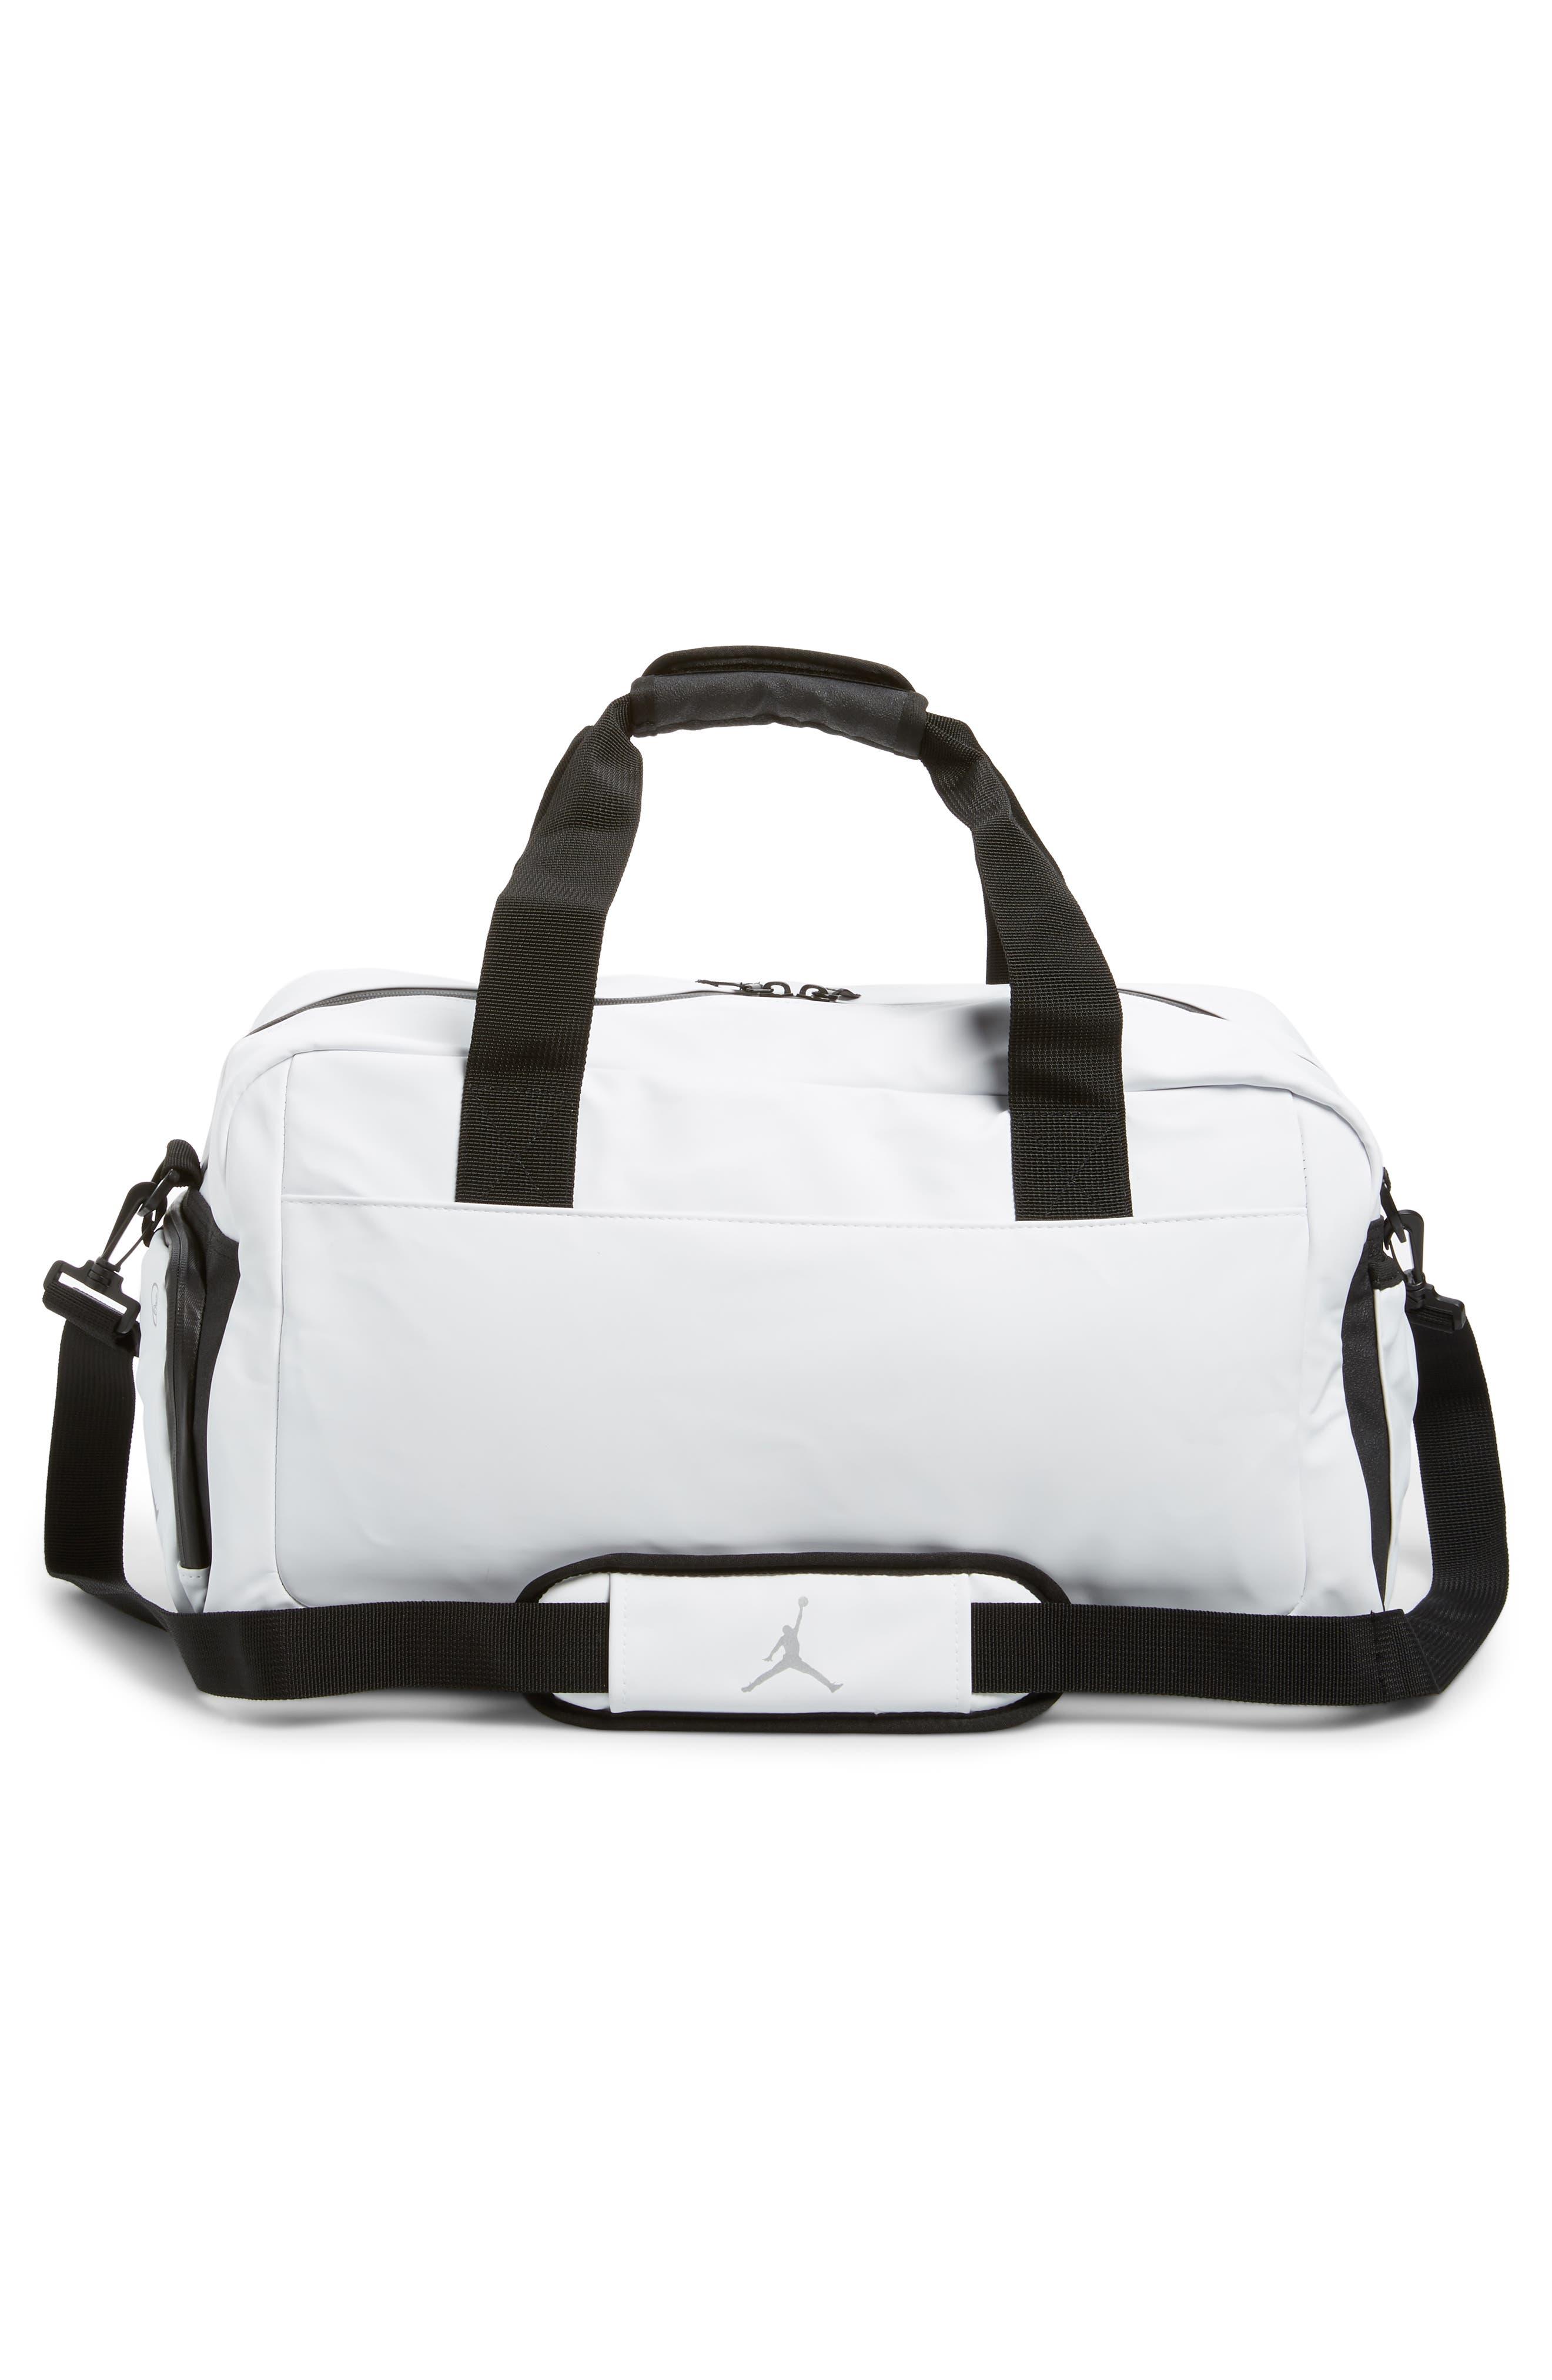 Jordan All World Edition Duffel Bag,                             Alternate thumbnail 2, color,                             WHITE